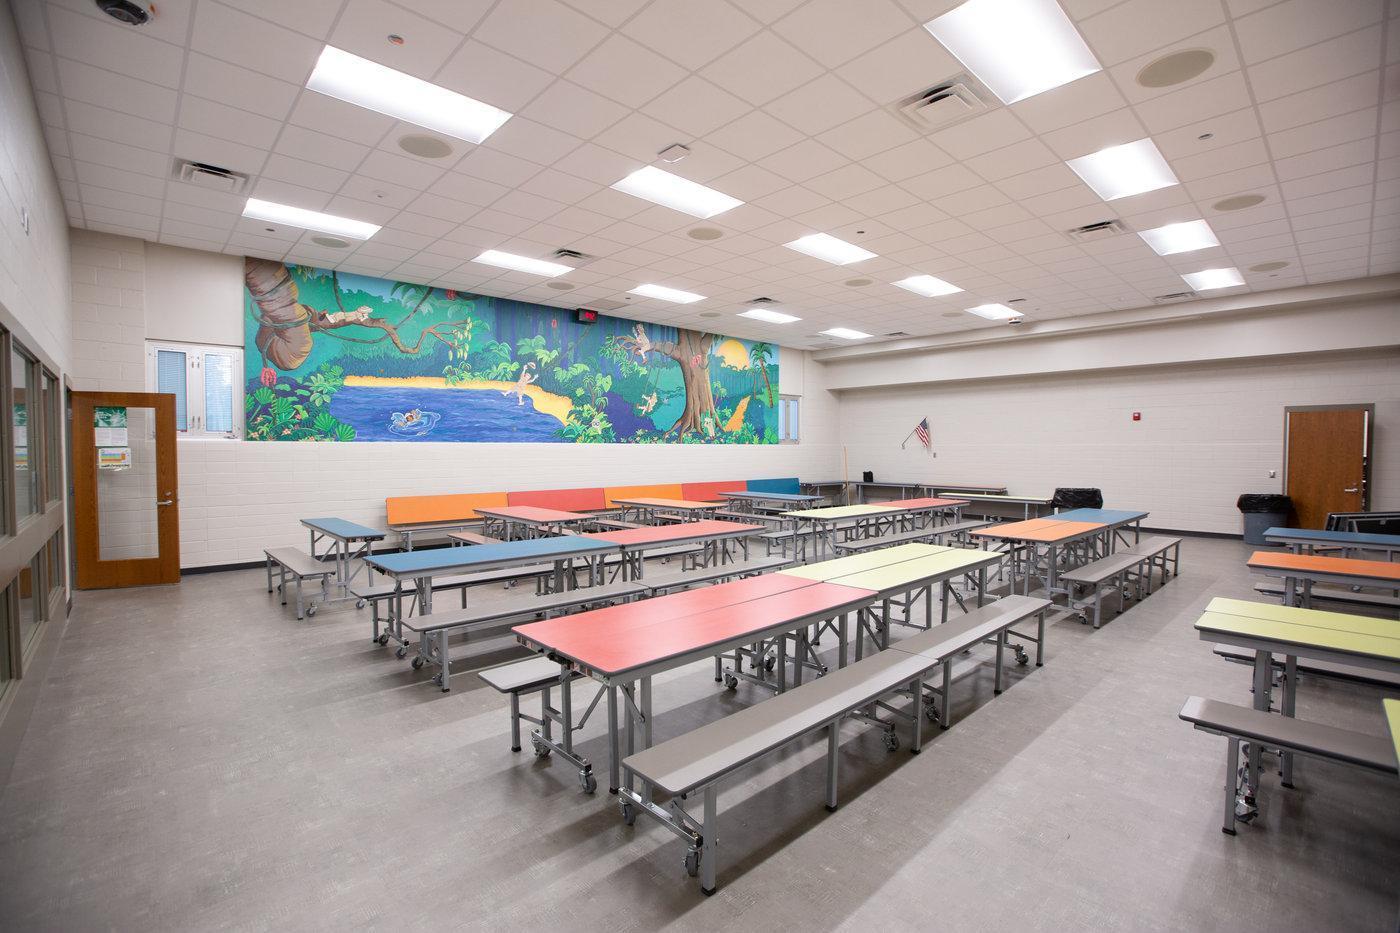 Northview Elementary School